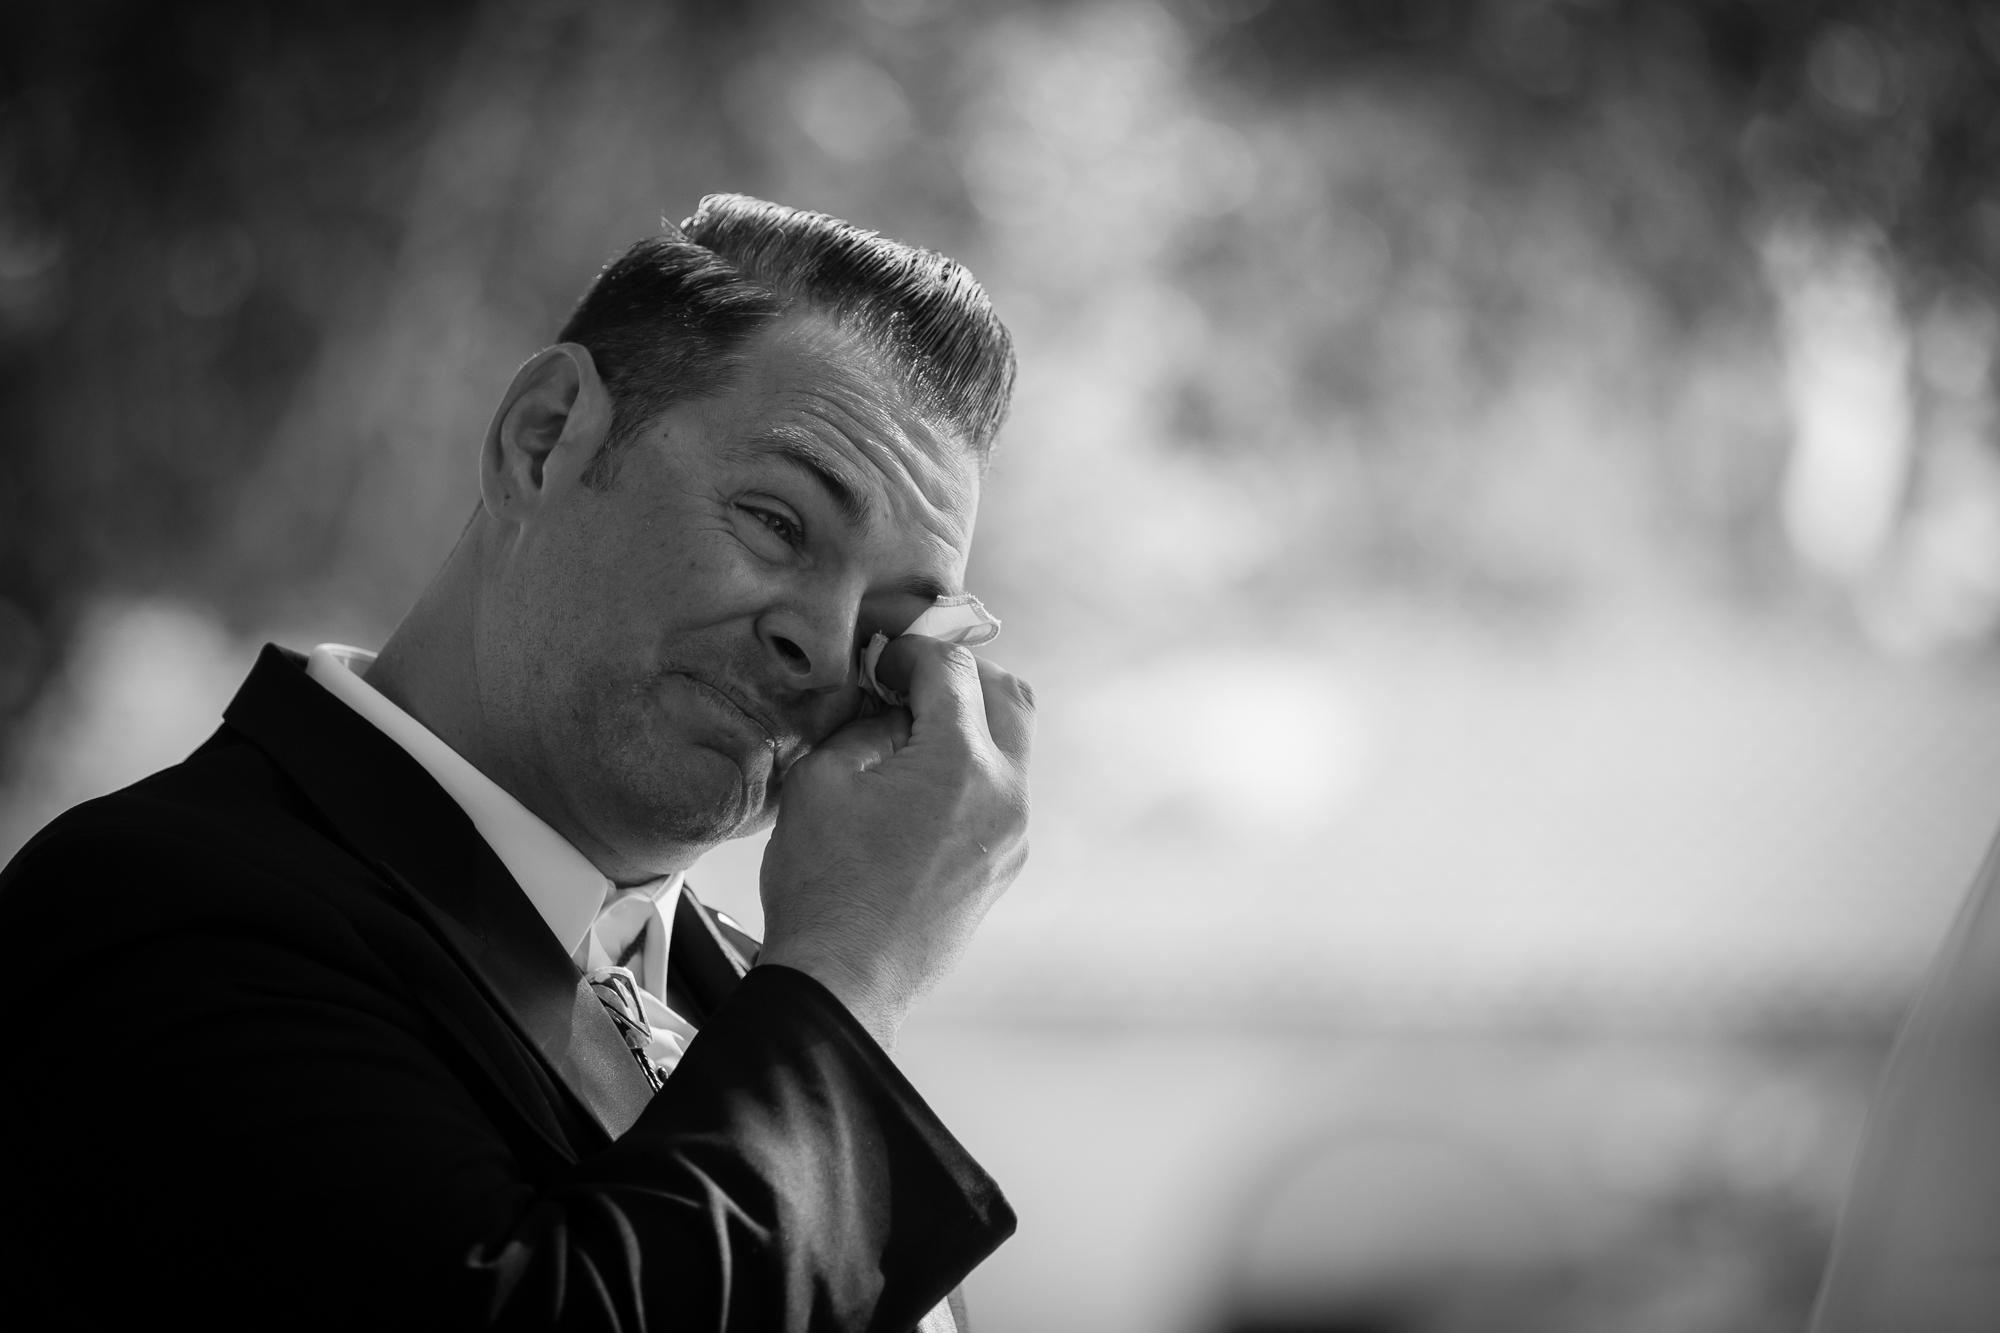 Gary-Kasl-SandKasl-Imaging-Wedding-Photography-29.jpg